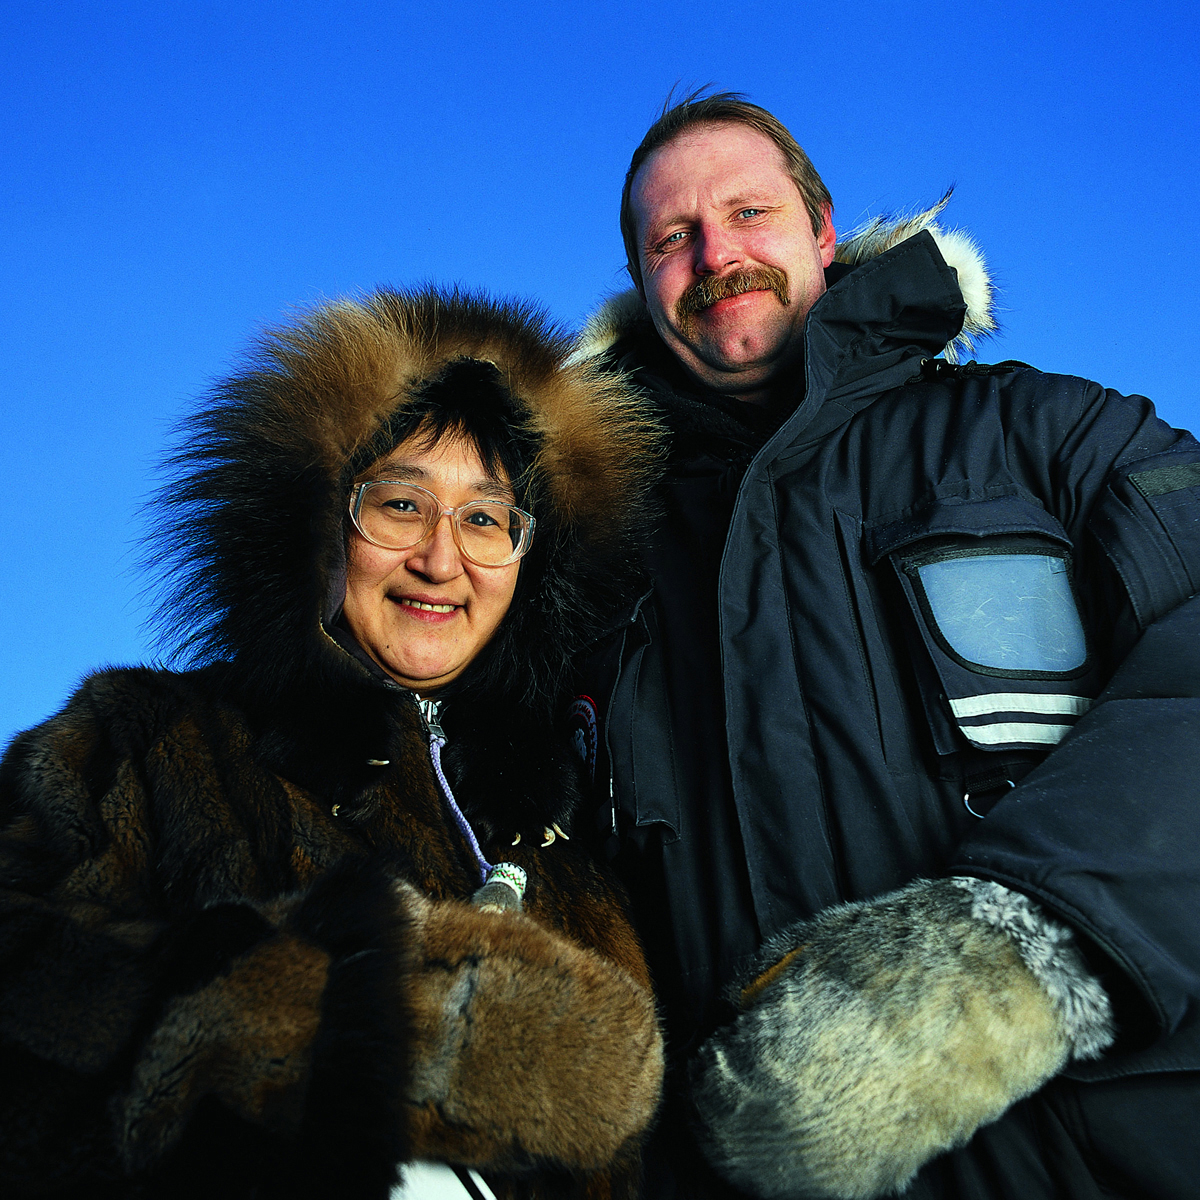 Royal Bank Cambridge Bay, Nunavut, location portrait